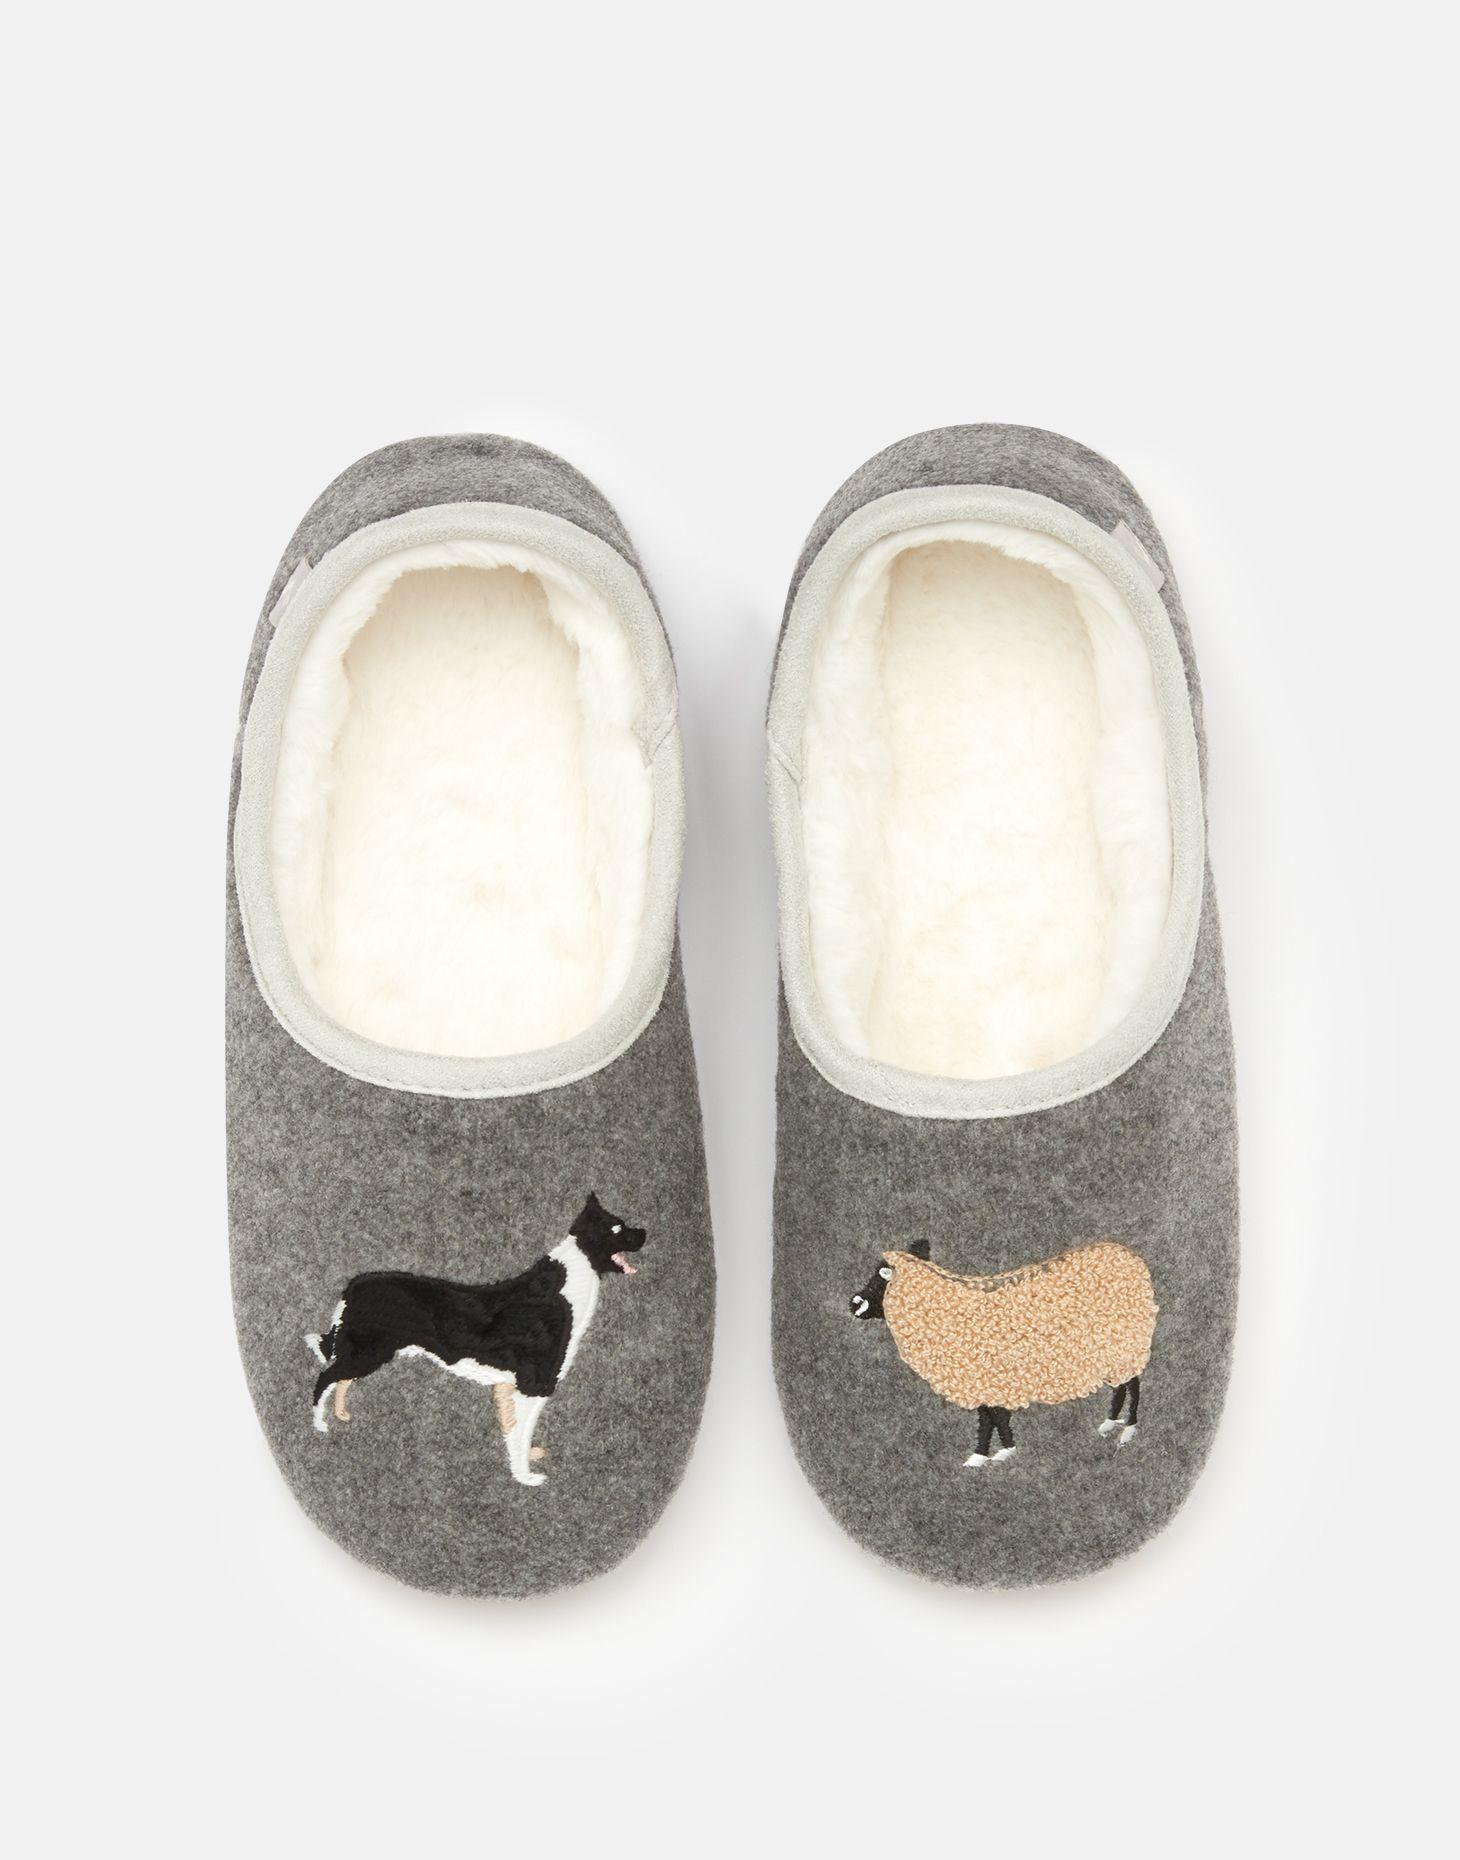 Womens Bulldog Head Print Sandals Slippers New Skid-Proof Shoes